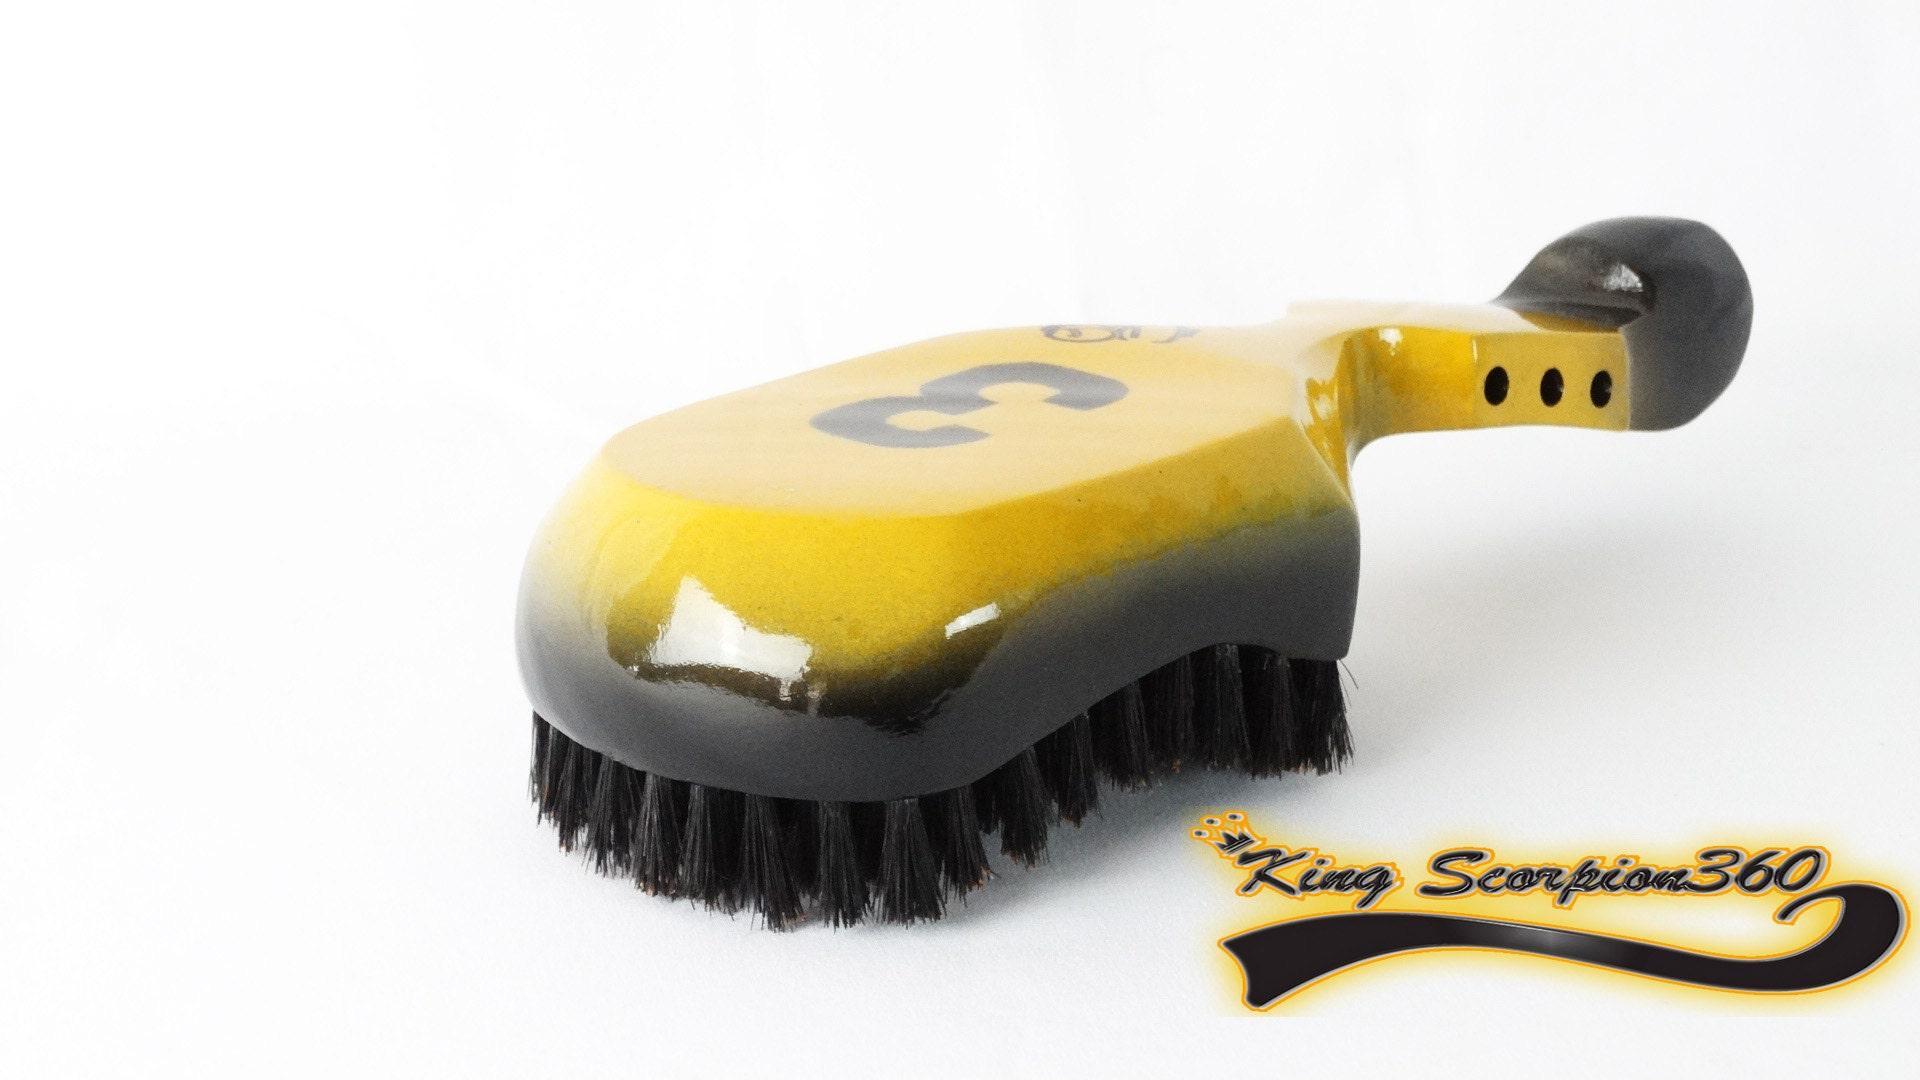 KING SCORPION - 360 Crushed Velvet Fat Lace Custom Du-Rag/Hair Wrap/Turban/Do-Rag - 10 Row King Scorpion Custom 360 Wave Brush Gift Bundle